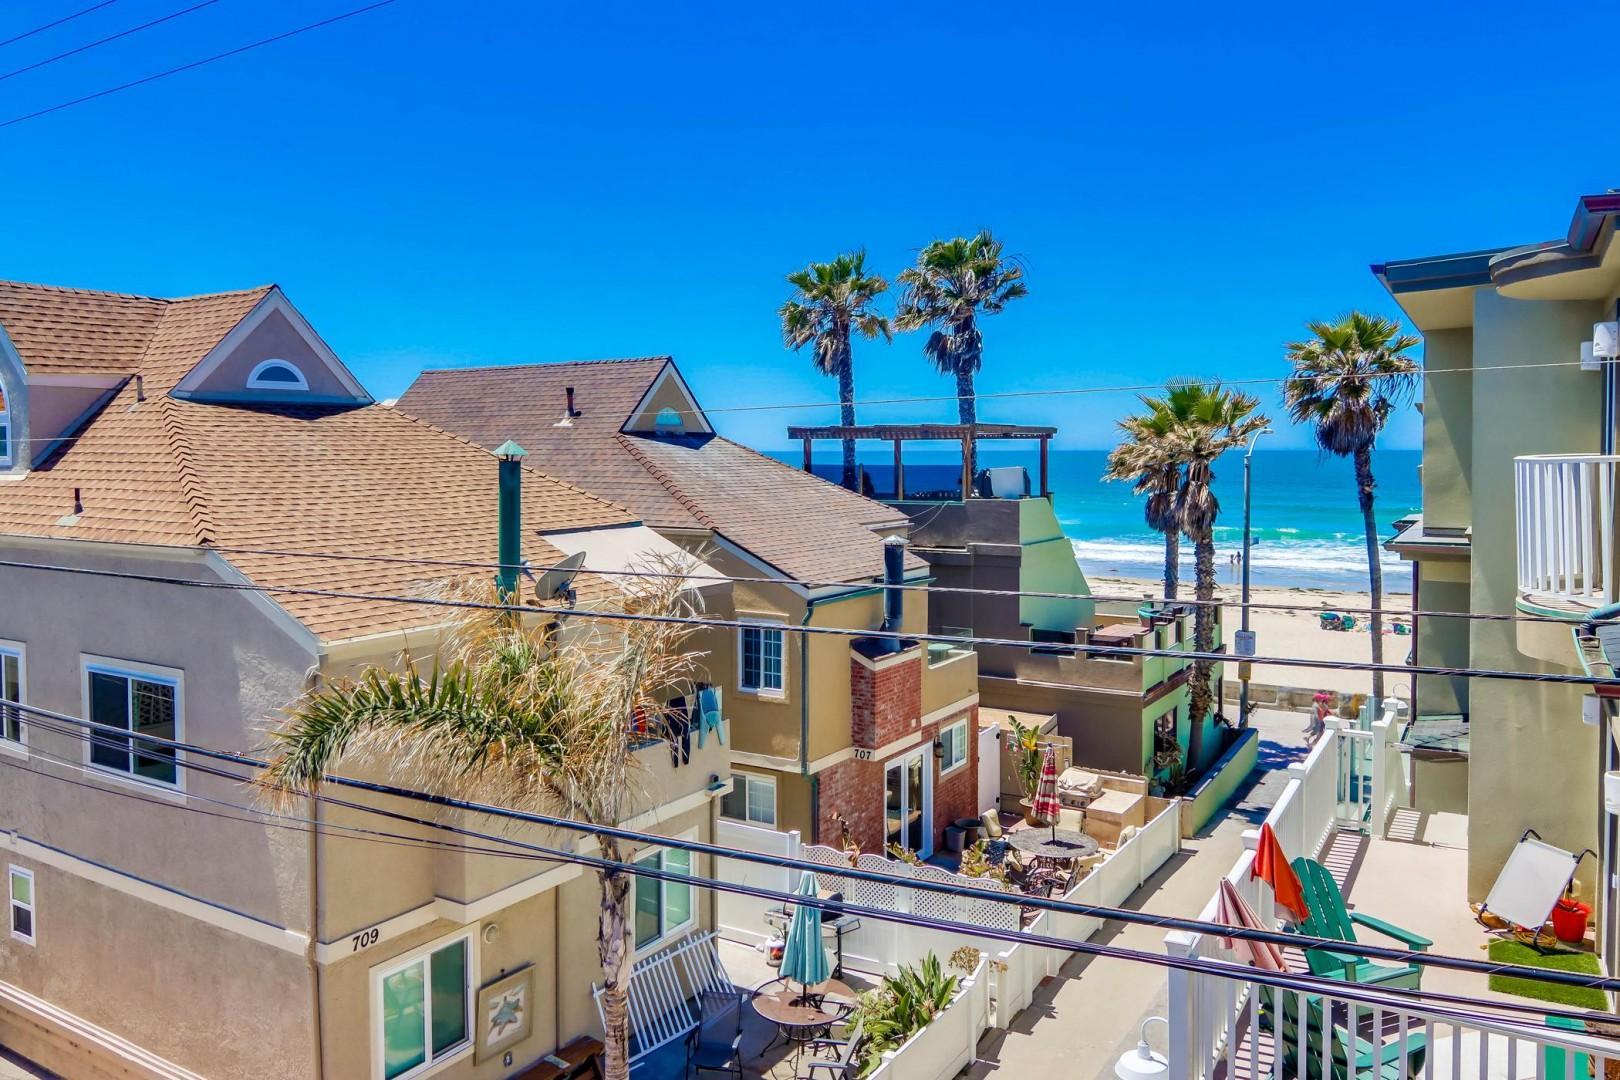 3721-strandway-2-049_2100x1400